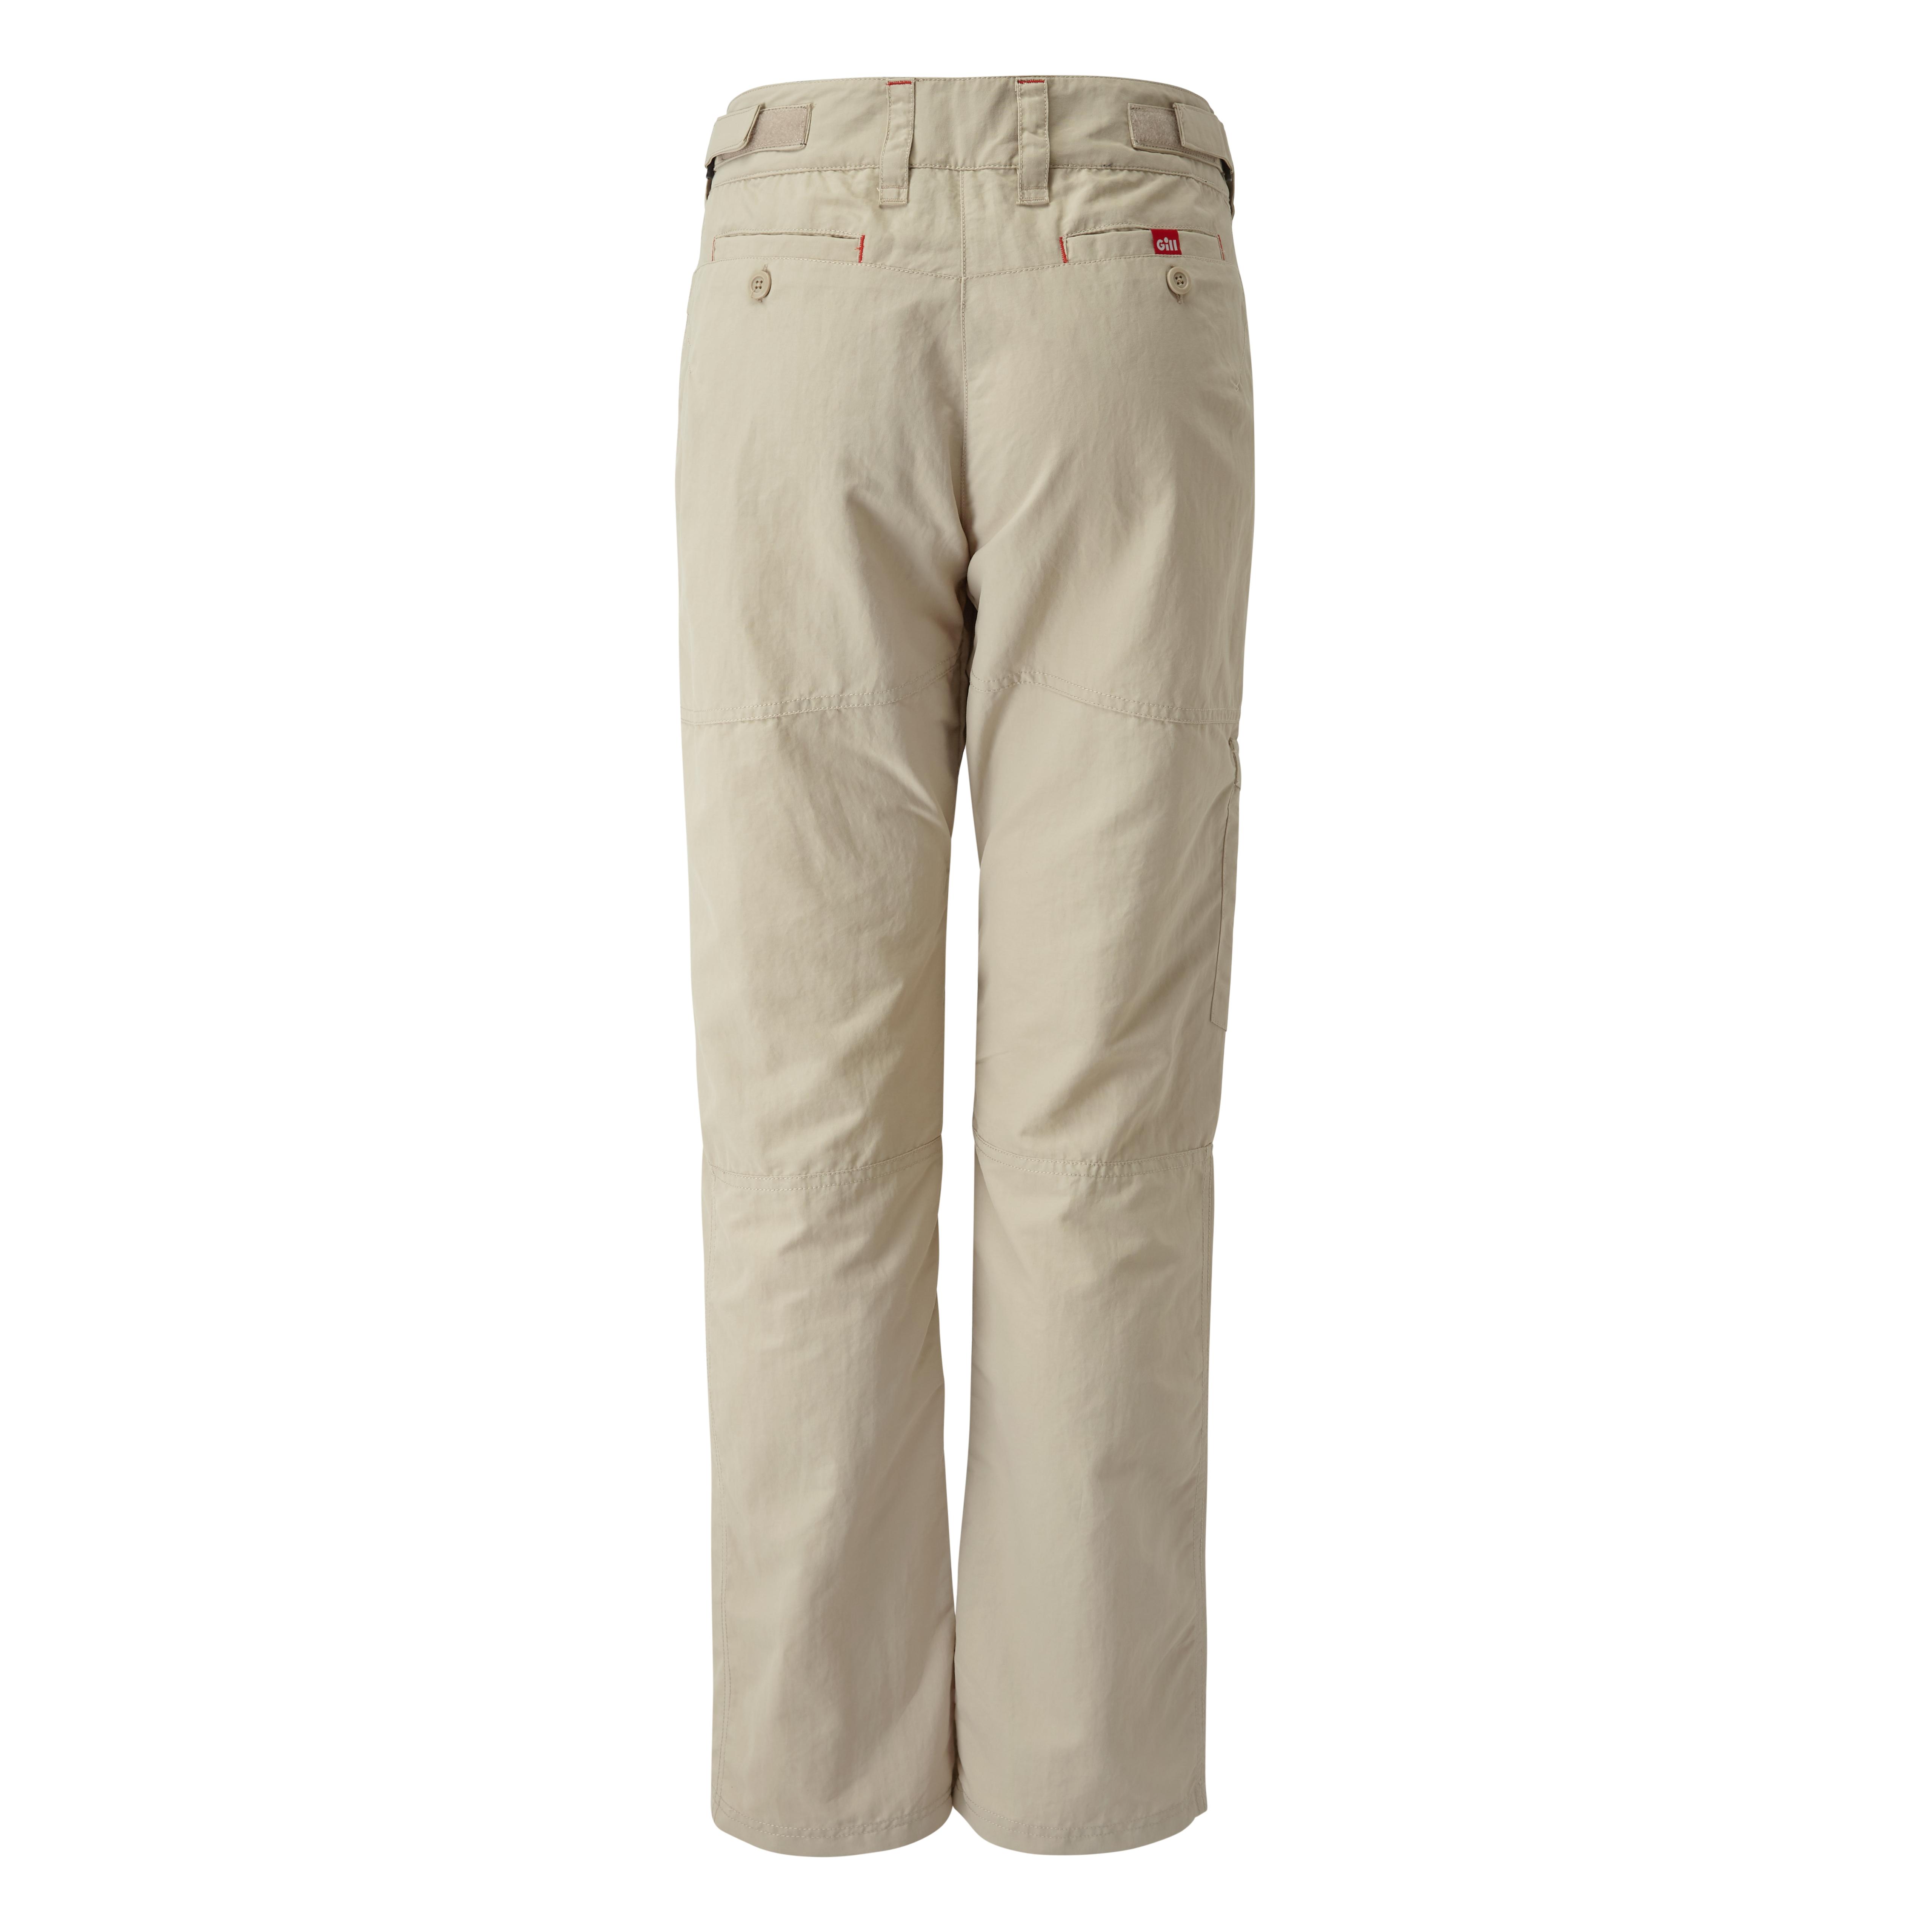 Women's UV Tec Trousers - UV014W-KHA01-3.jpg